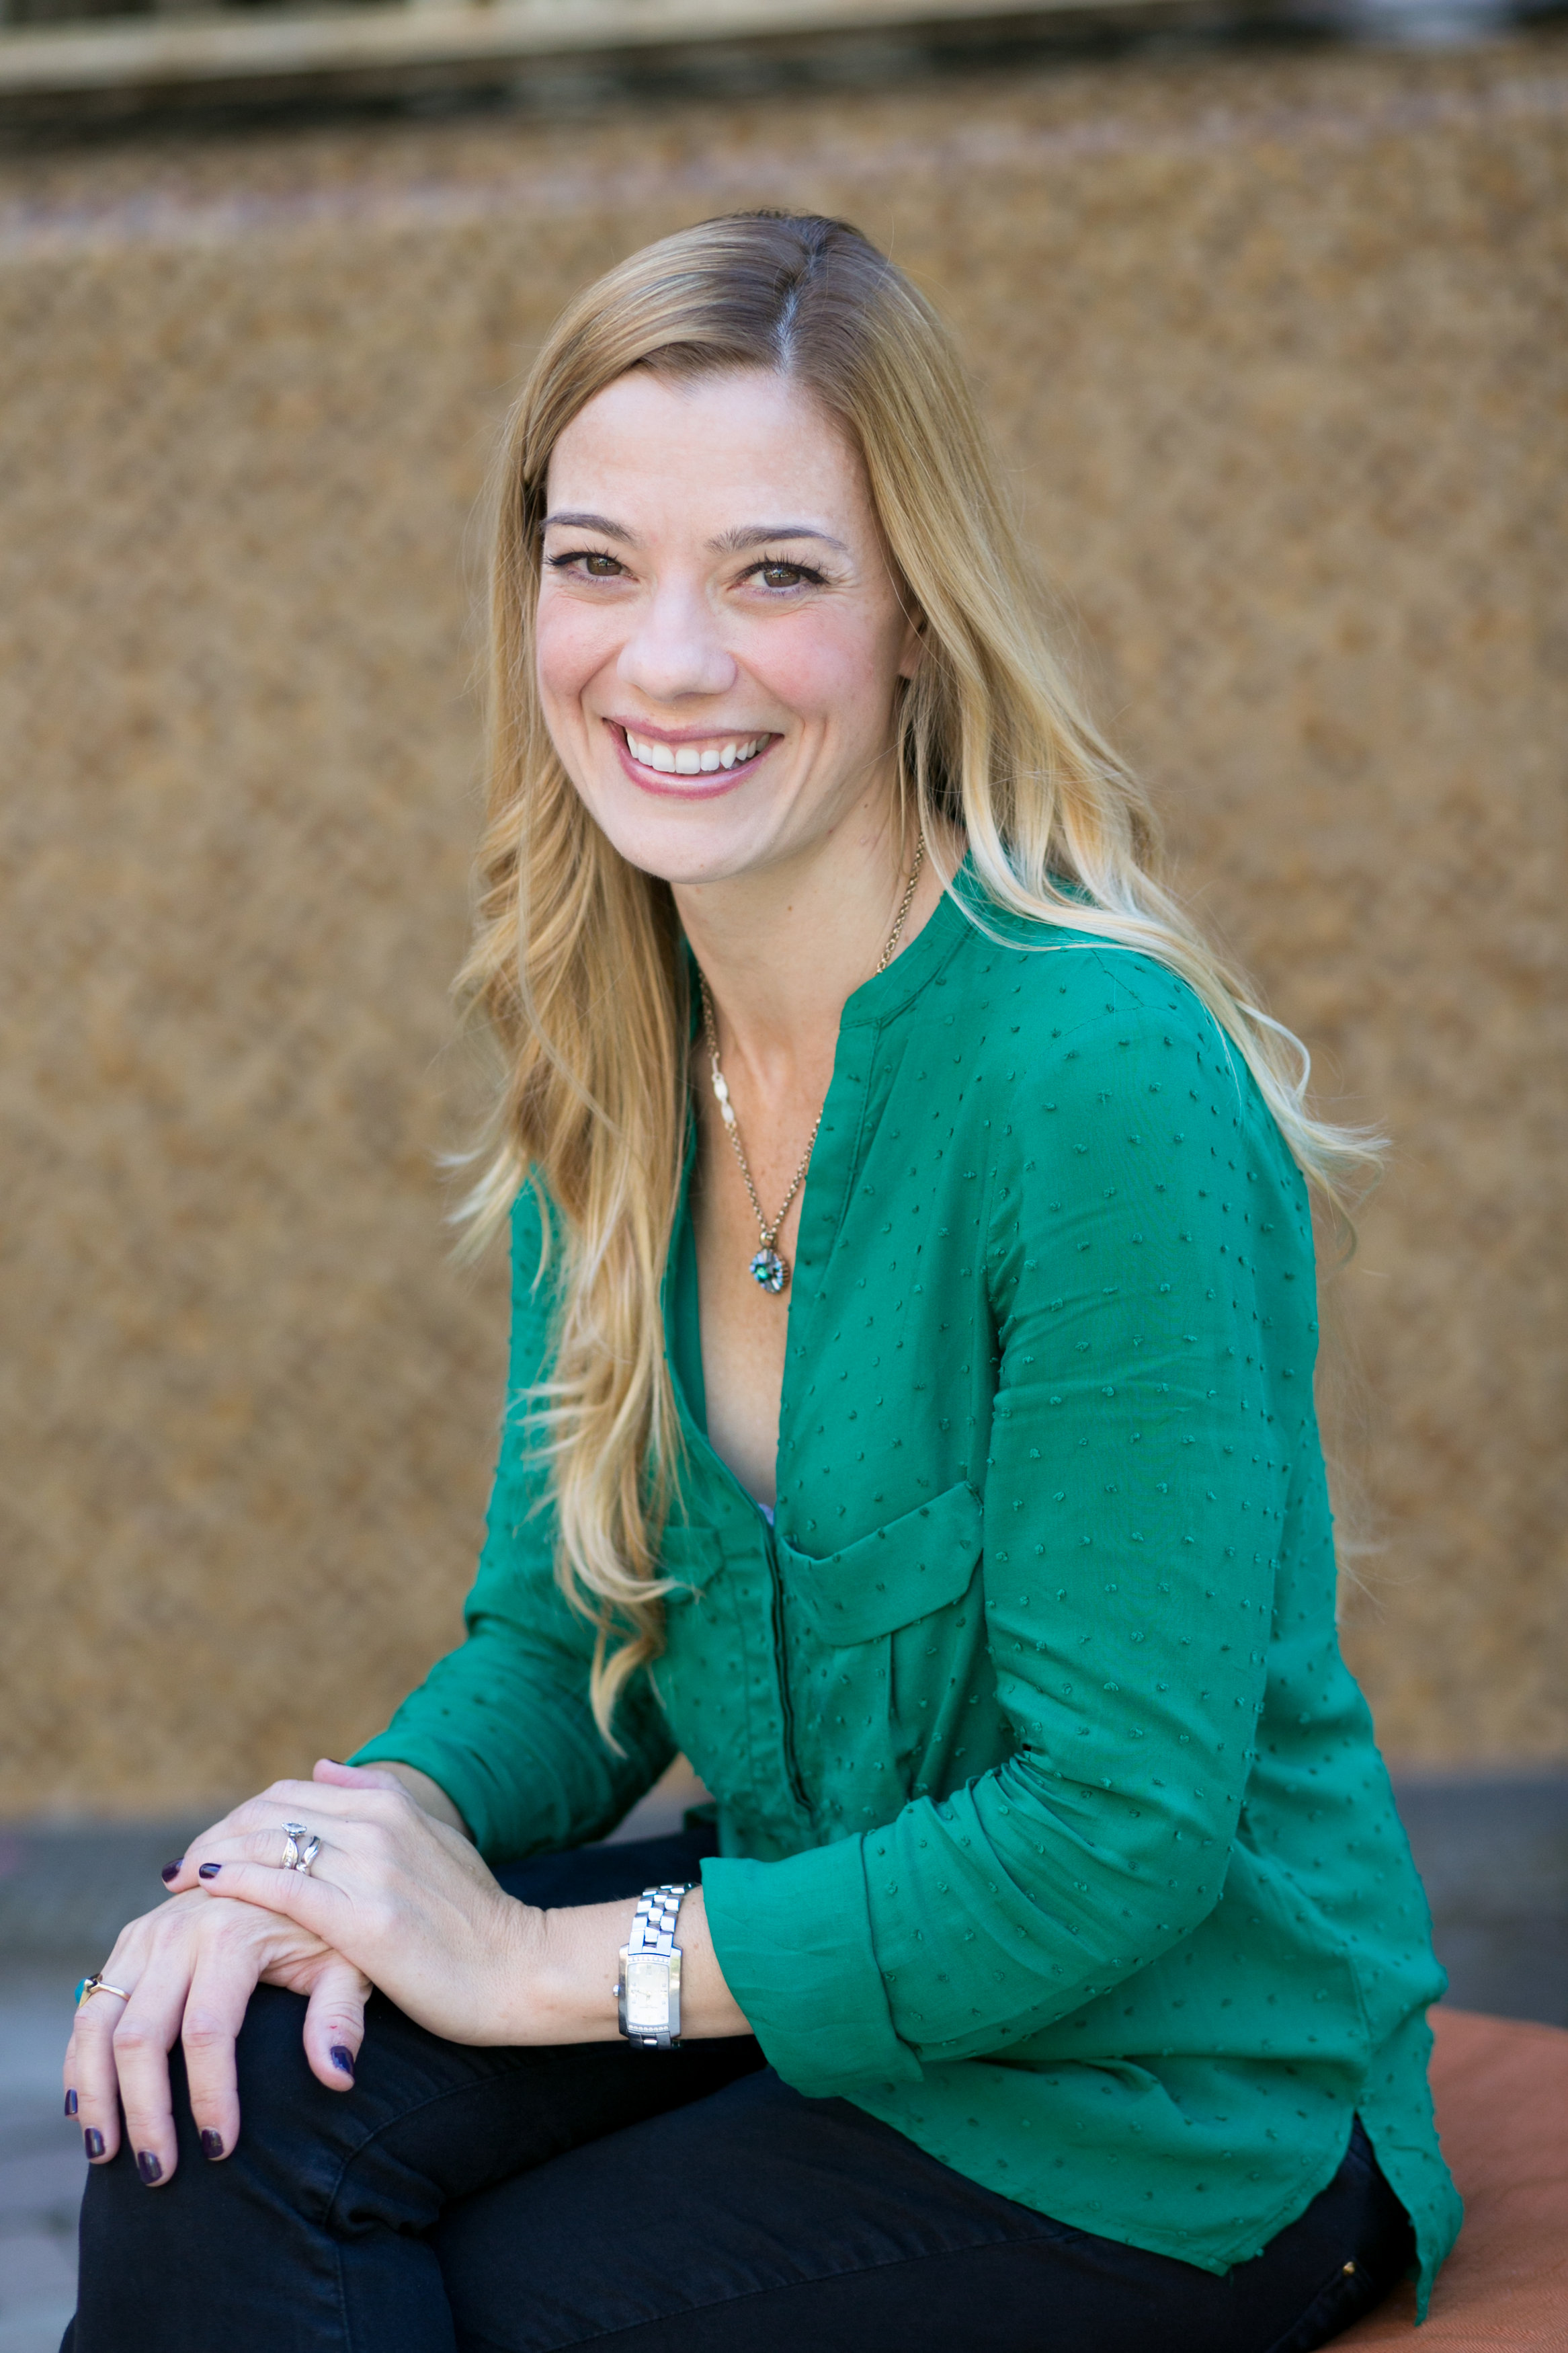 Kimberly Coyle